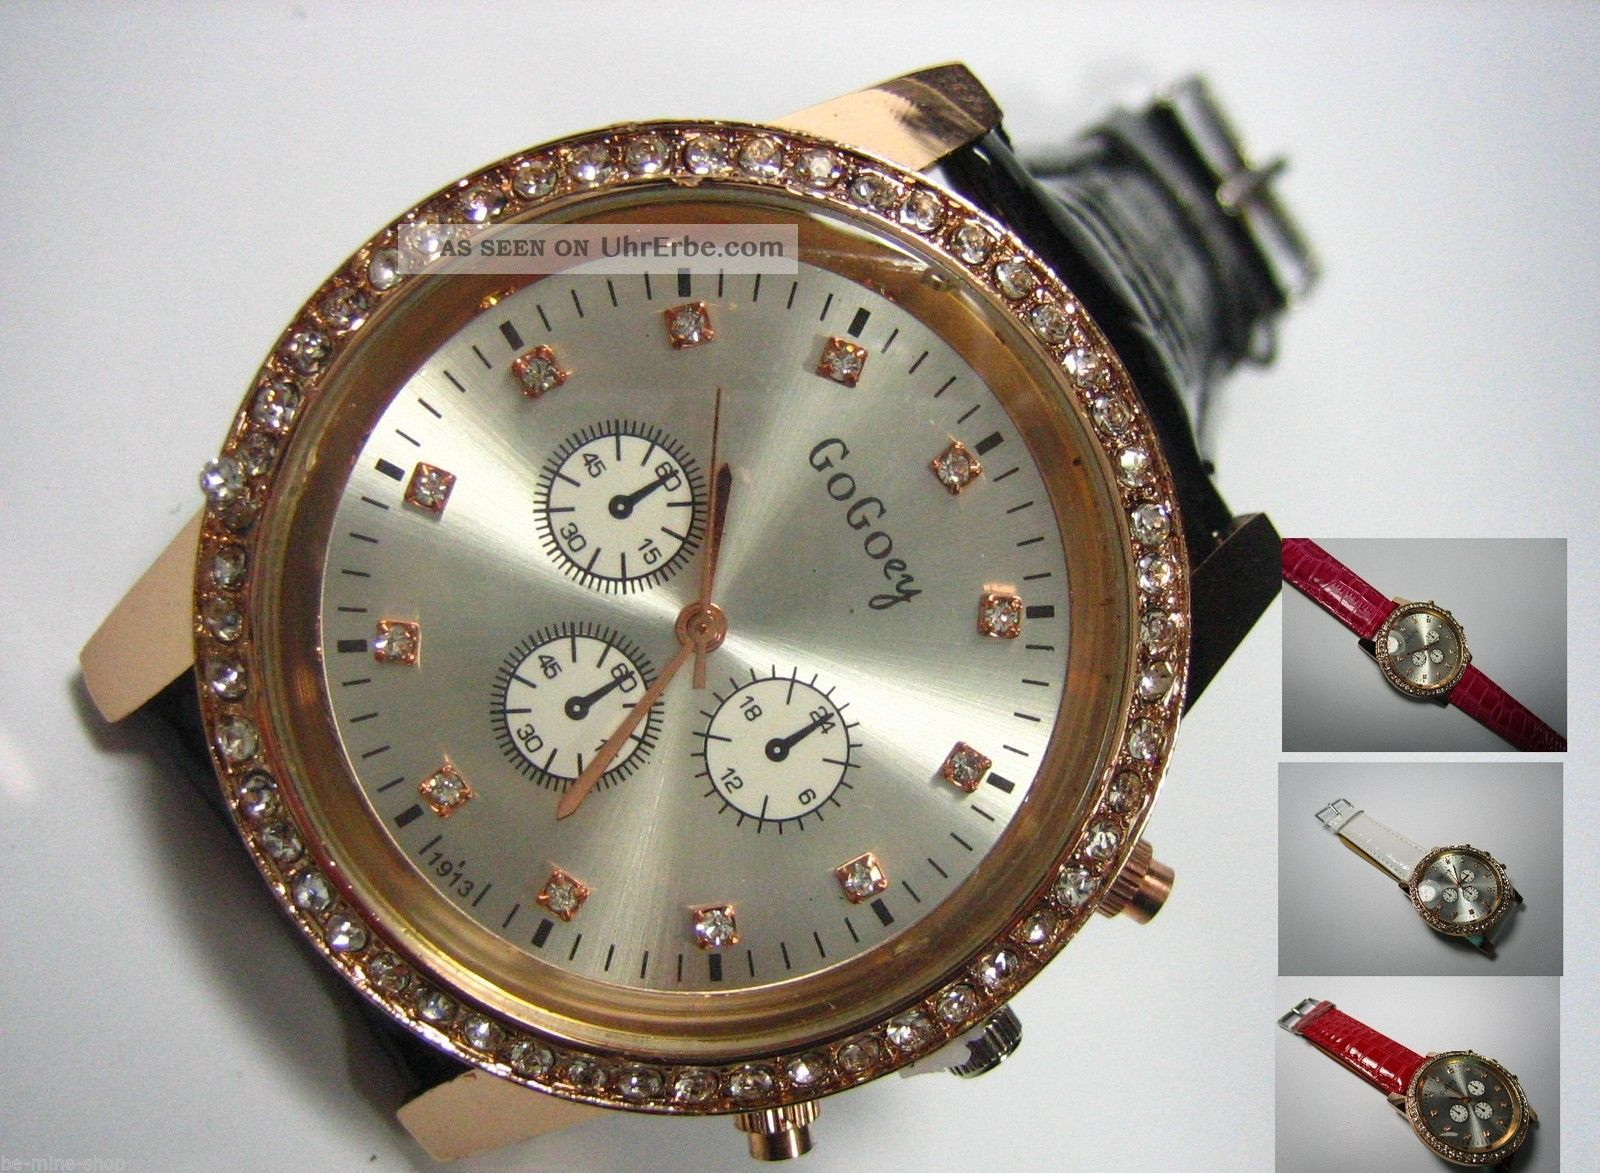 Damen Uhr Strass Zirkonia Gross Rosé - Gold Chronograph Kroko Lederarmband Armbanduhren Bild